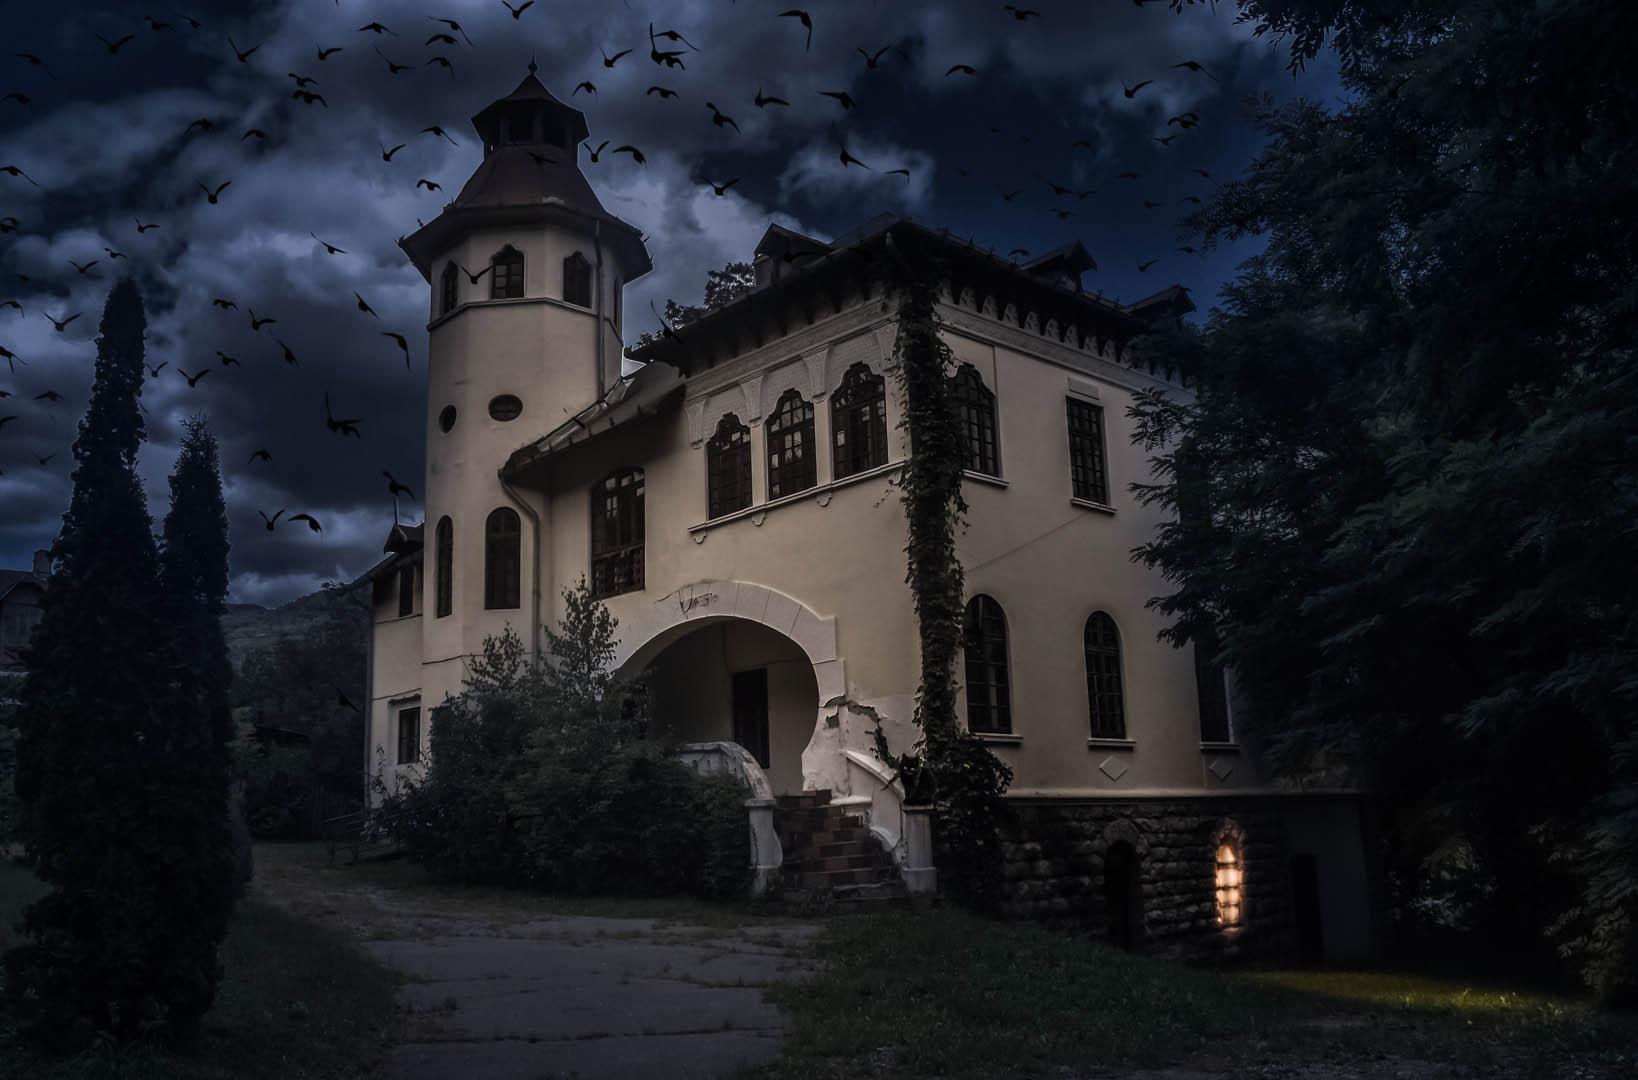 The Dark Manor